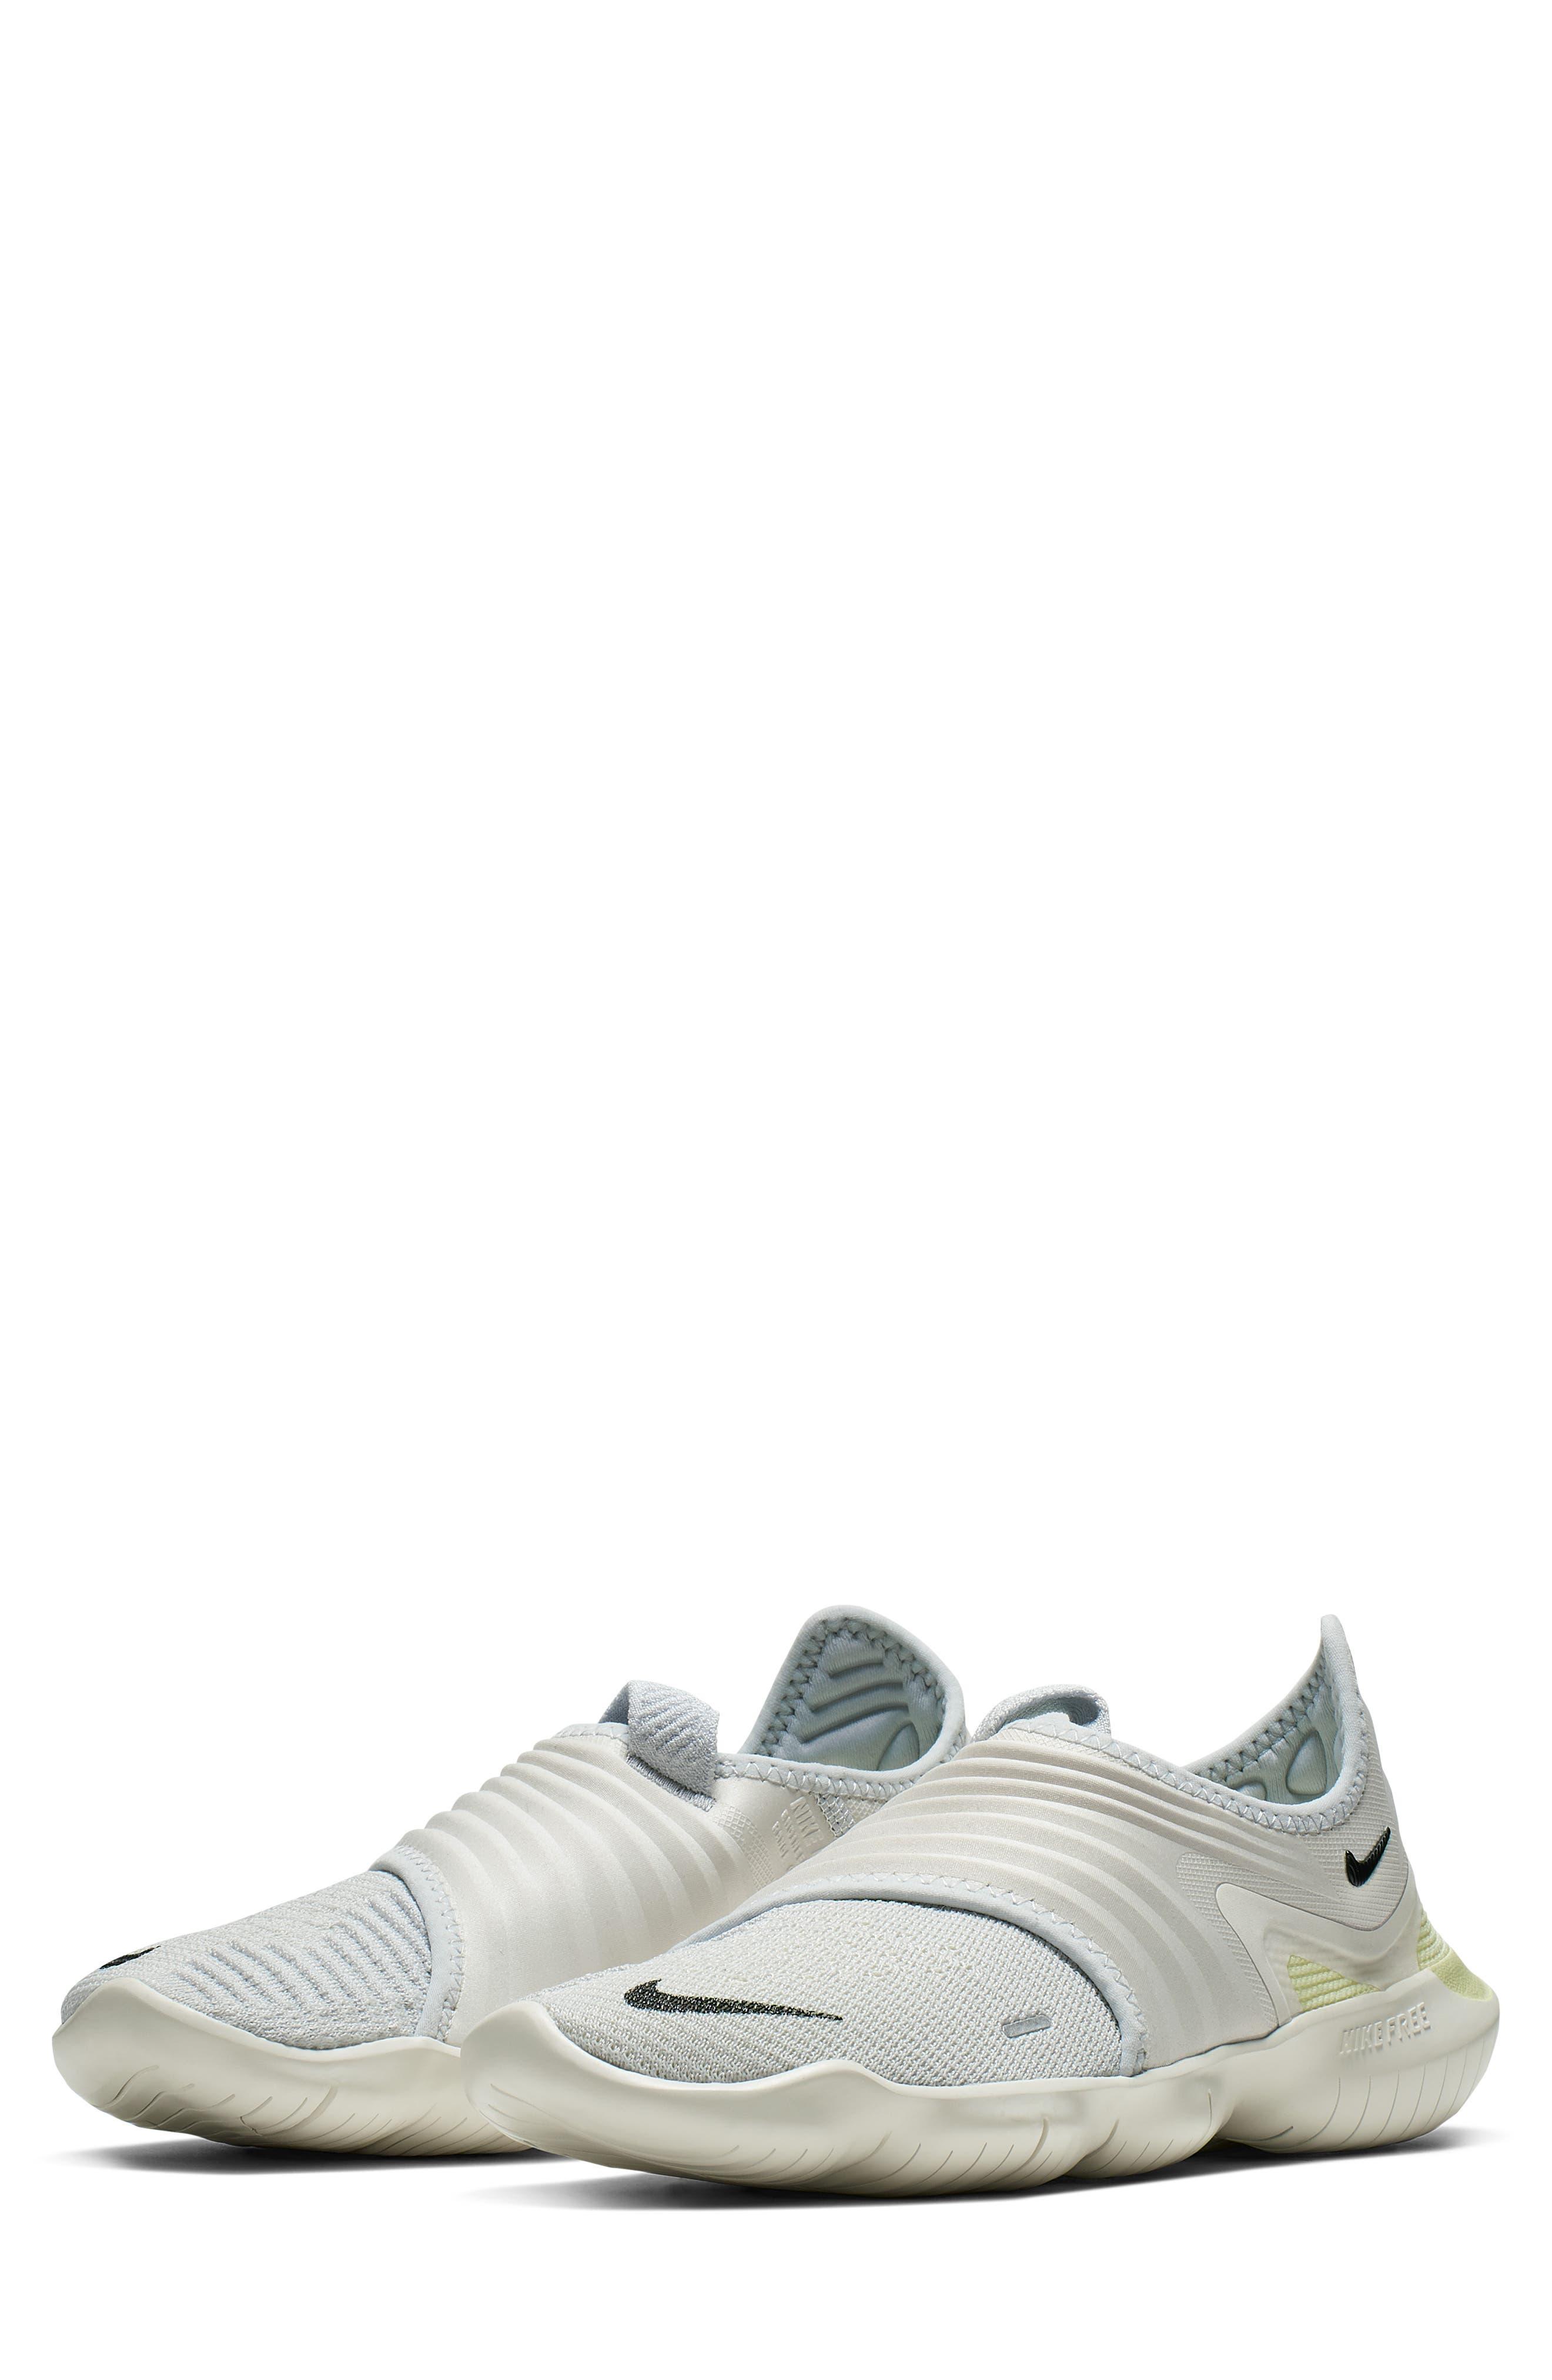 NIKE, Free RN Flyknit 3.0 Running Shoe, Main thumbnail 1, color, PURE PLATINUM/ BLACK/ GREEN